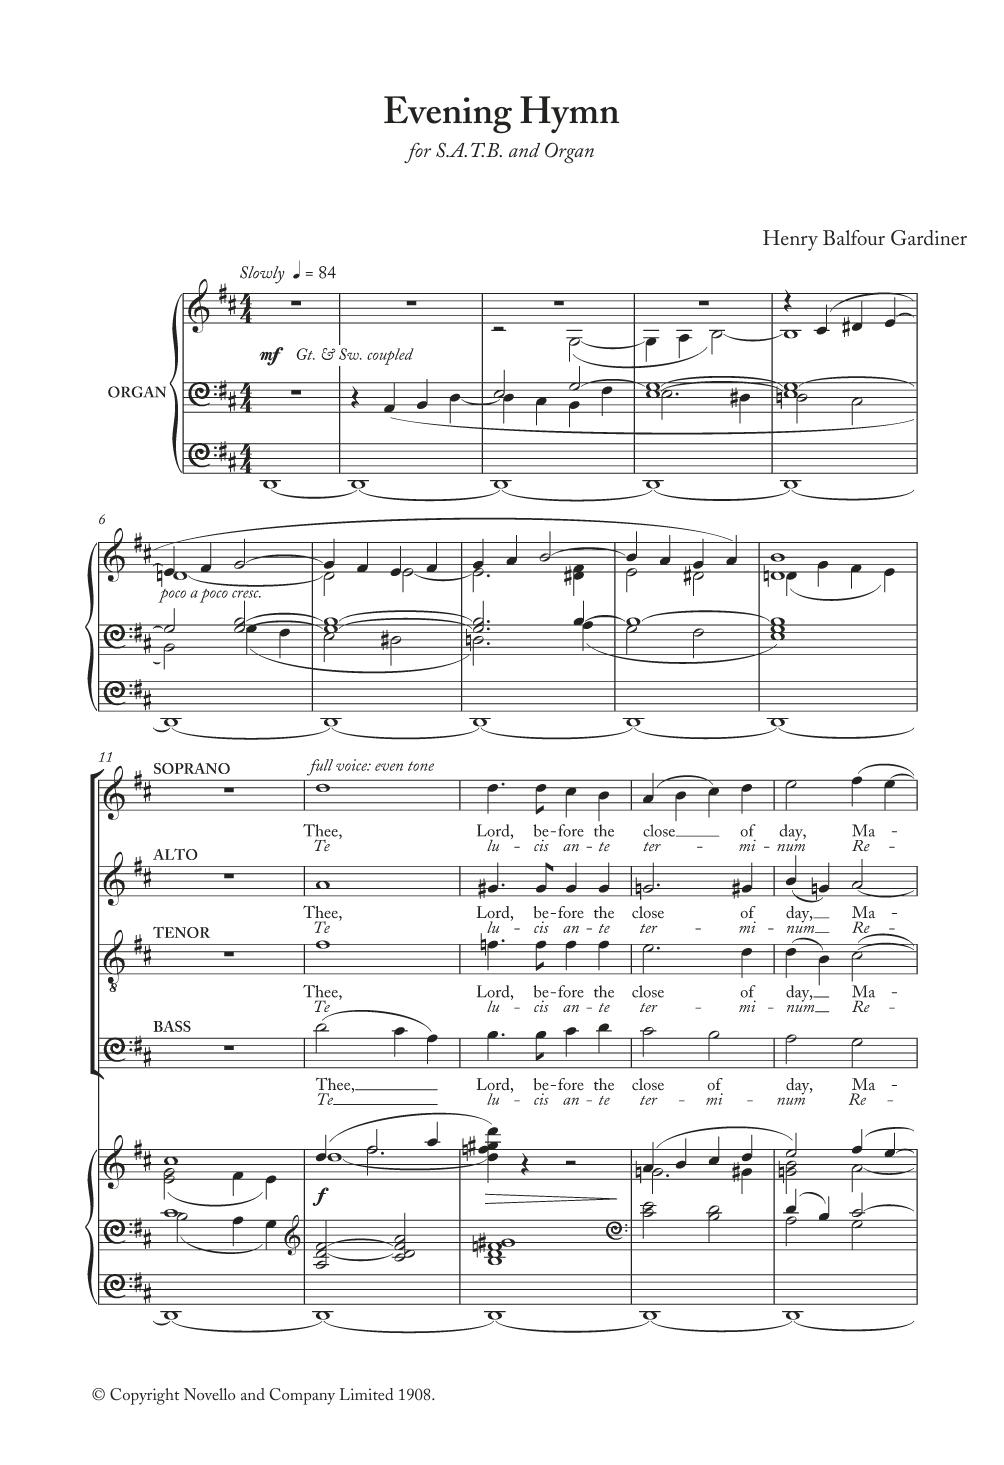 Henry Balfour Gardiner - Evening Hymn